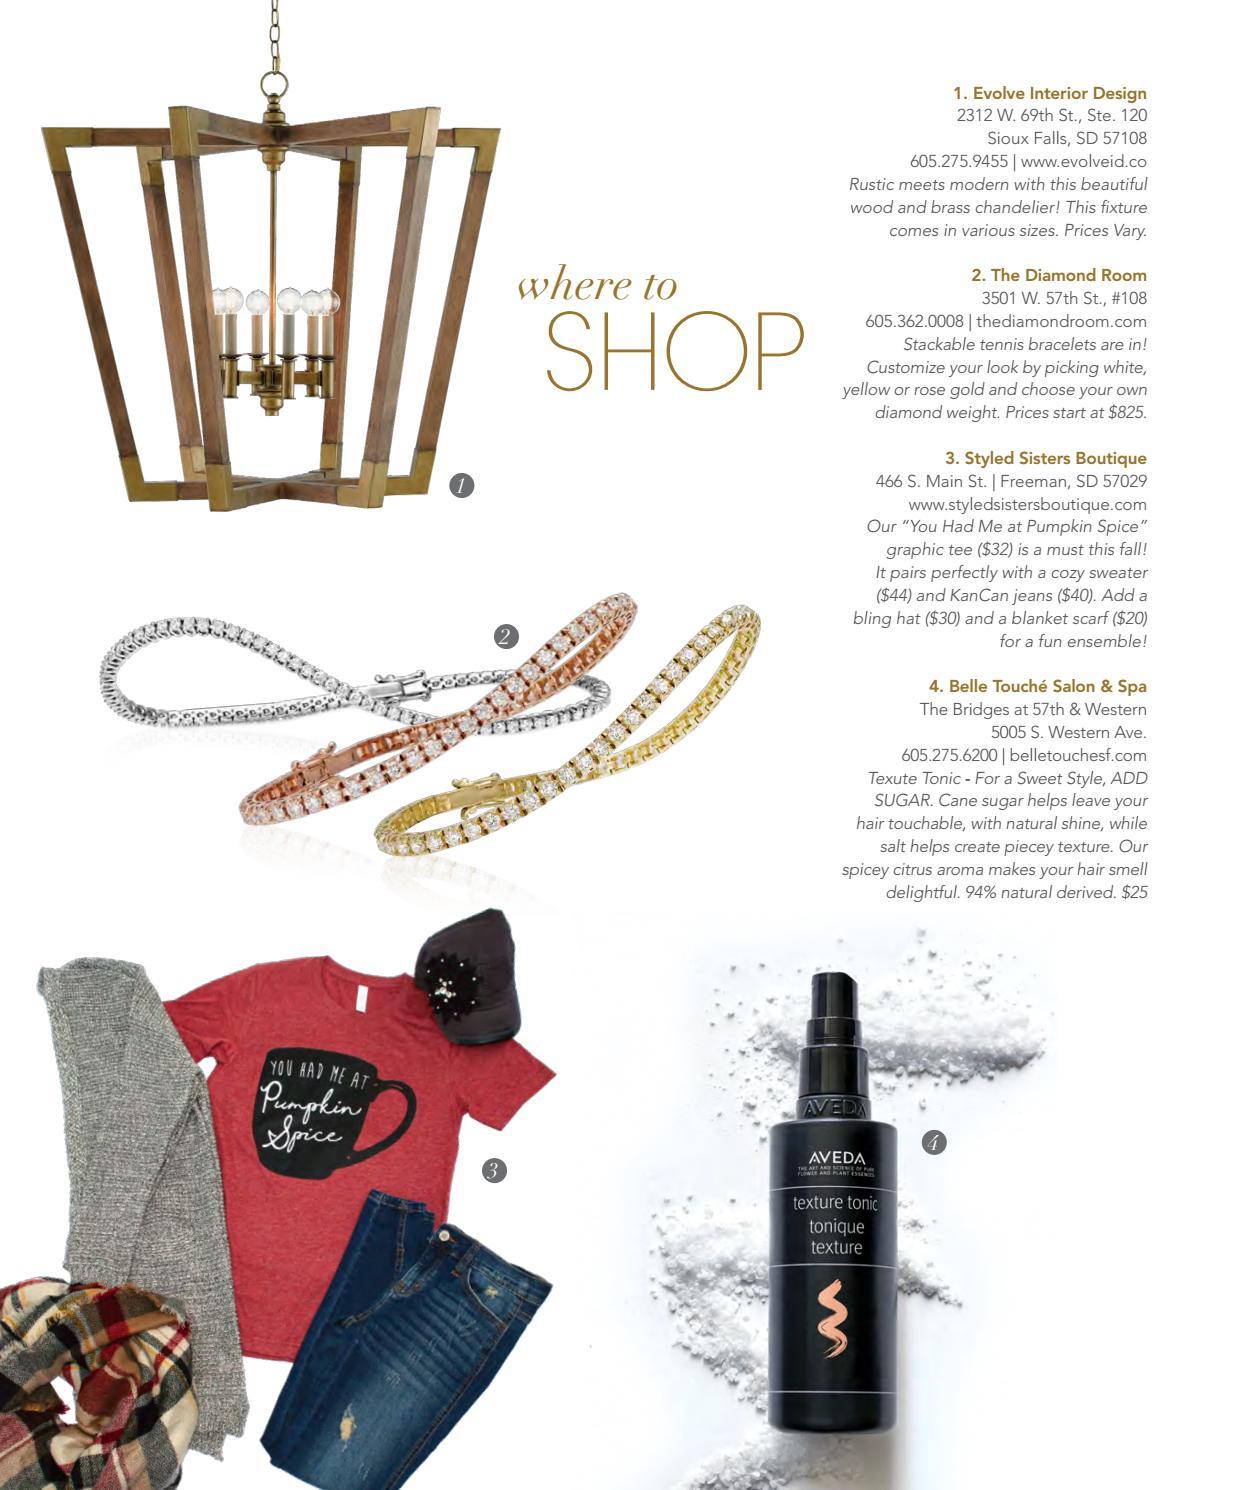 Sioux Falls Woman Magazine October November 2017 By Sioux Falls Woman Llc Issuu